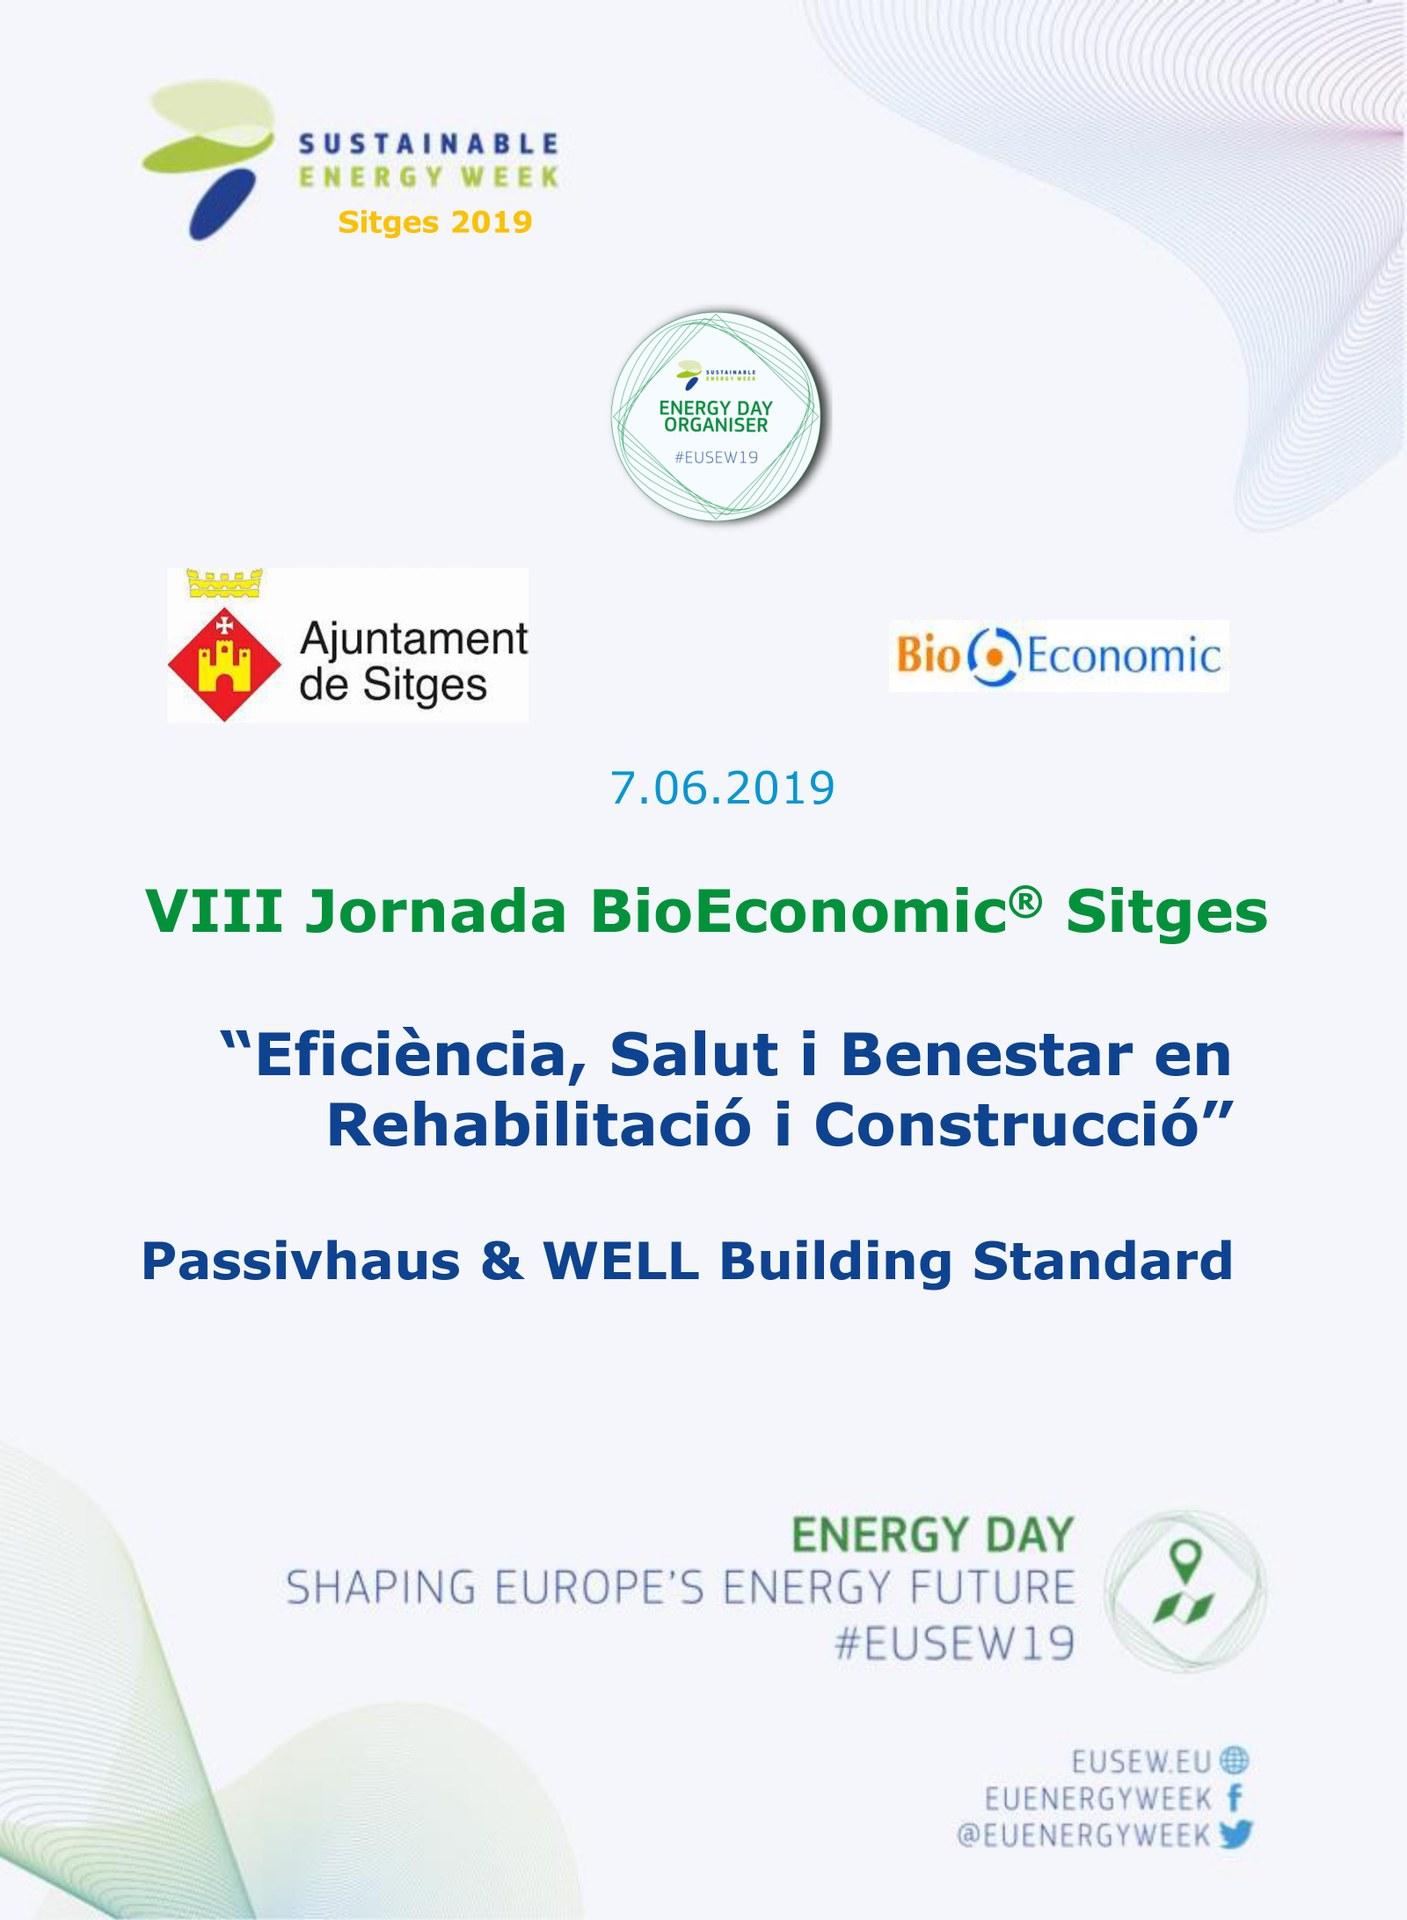 VIII Jornada BioEconomic Sitges 2019